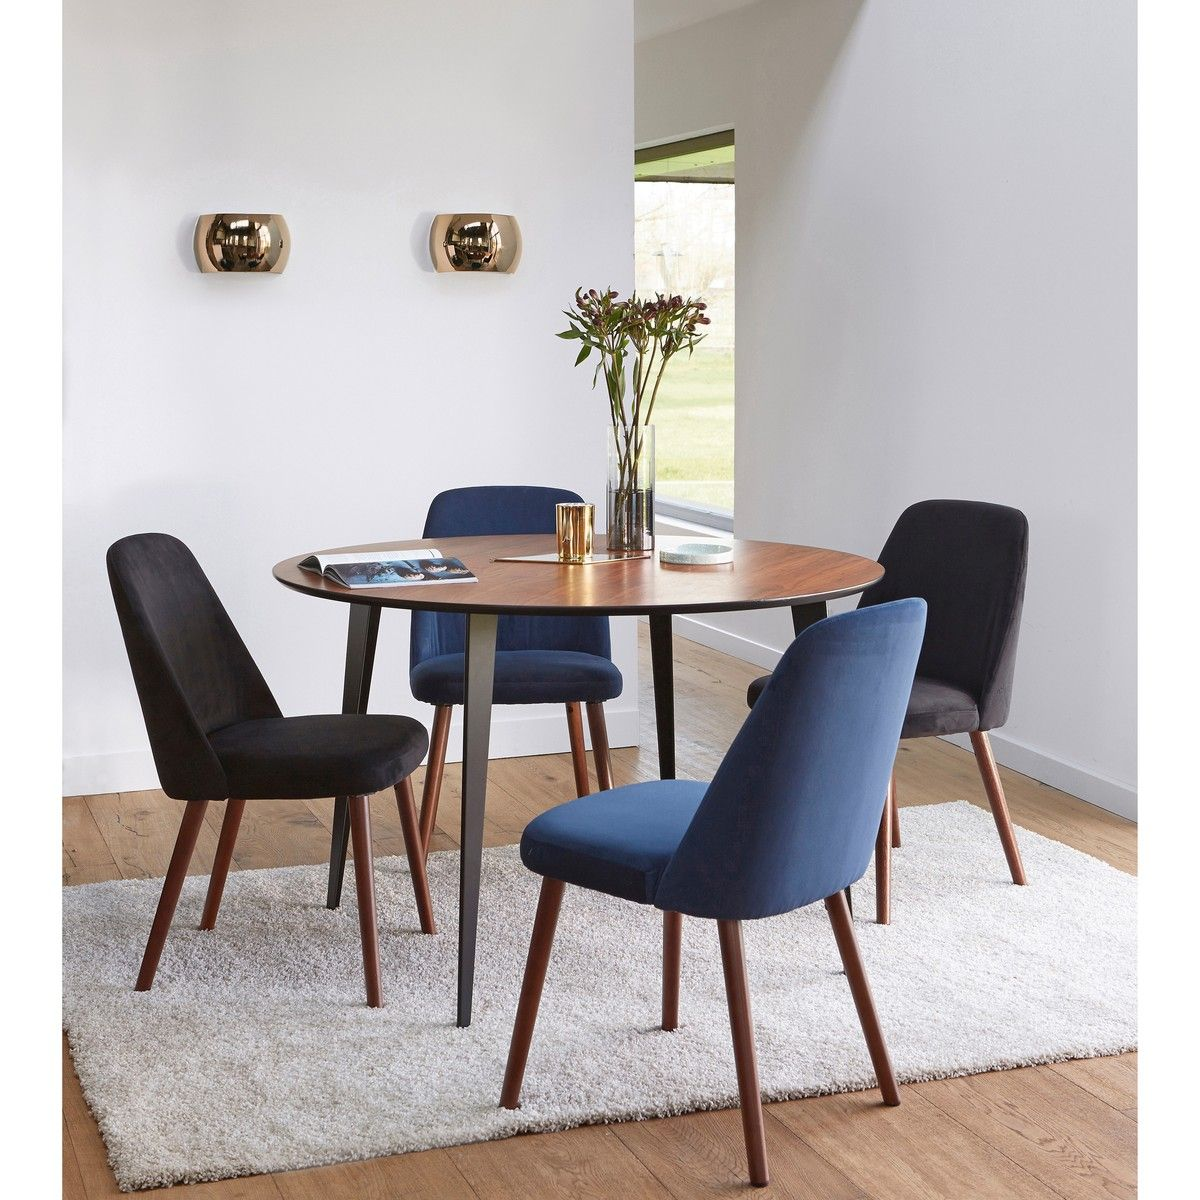 Watford Vintage Style Walnut Metal Round Dining Table Seats 4